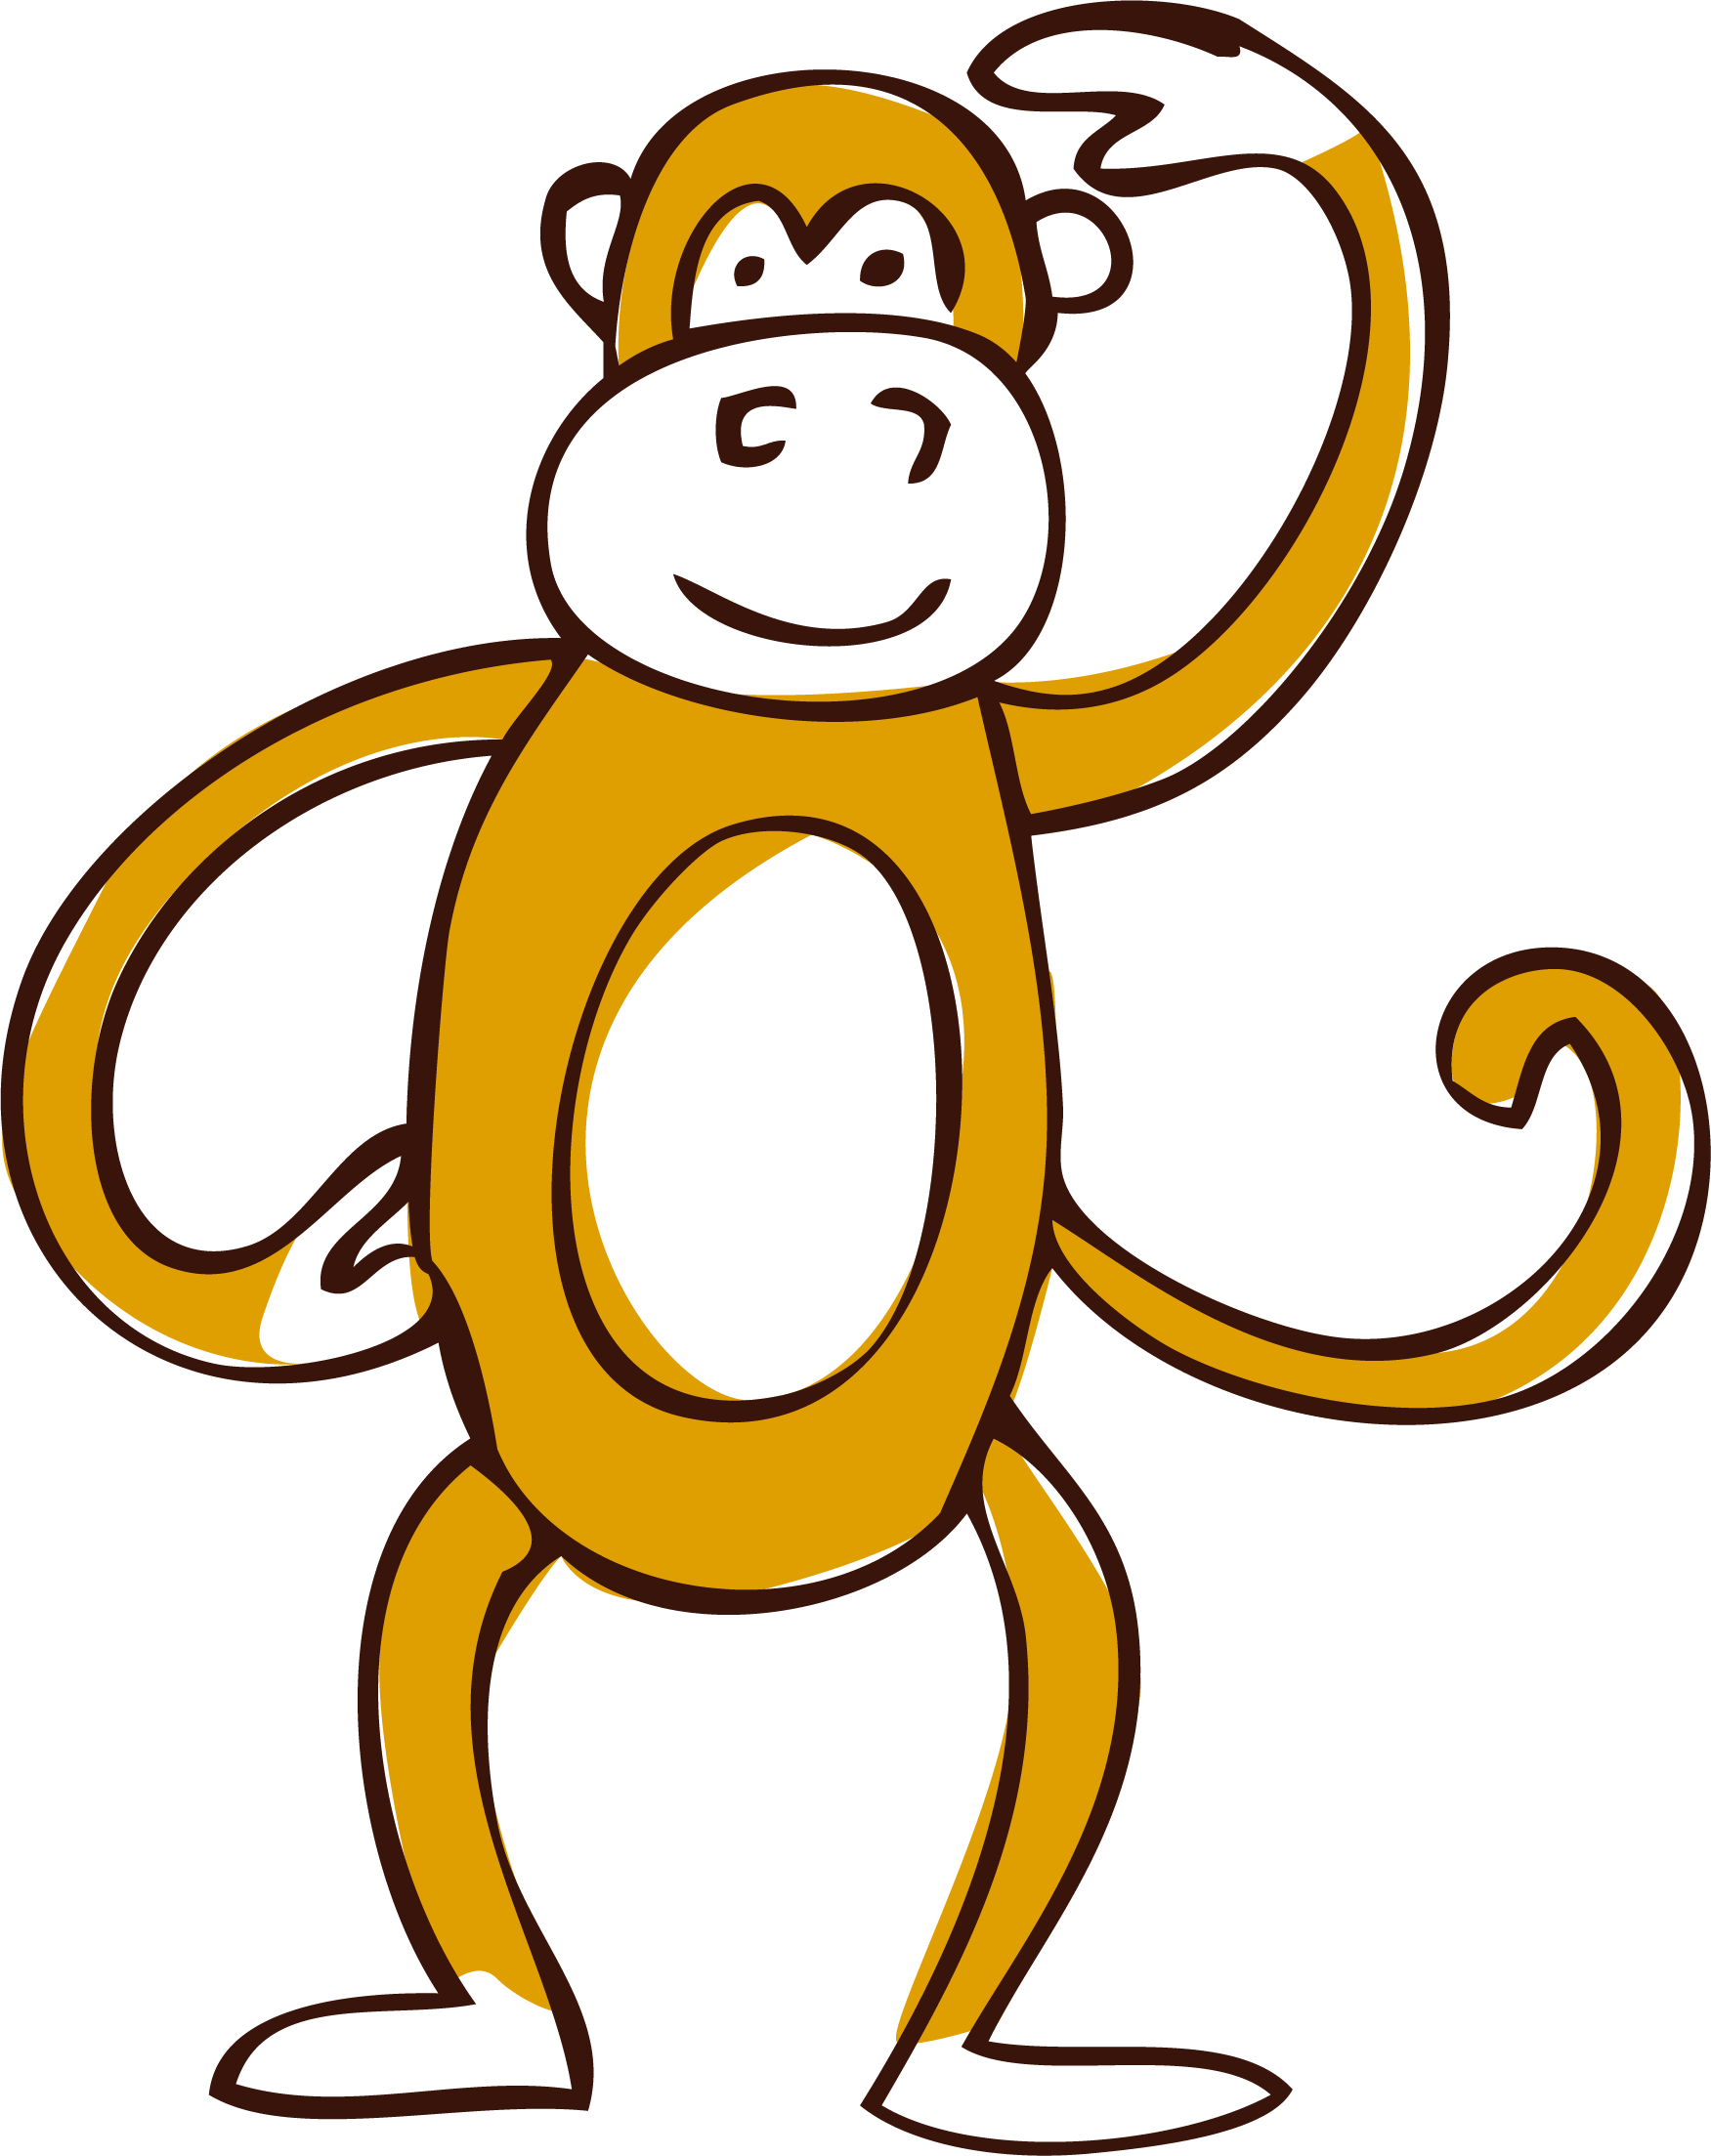 Clip art vector monkey. Monkeys clipart watercolor